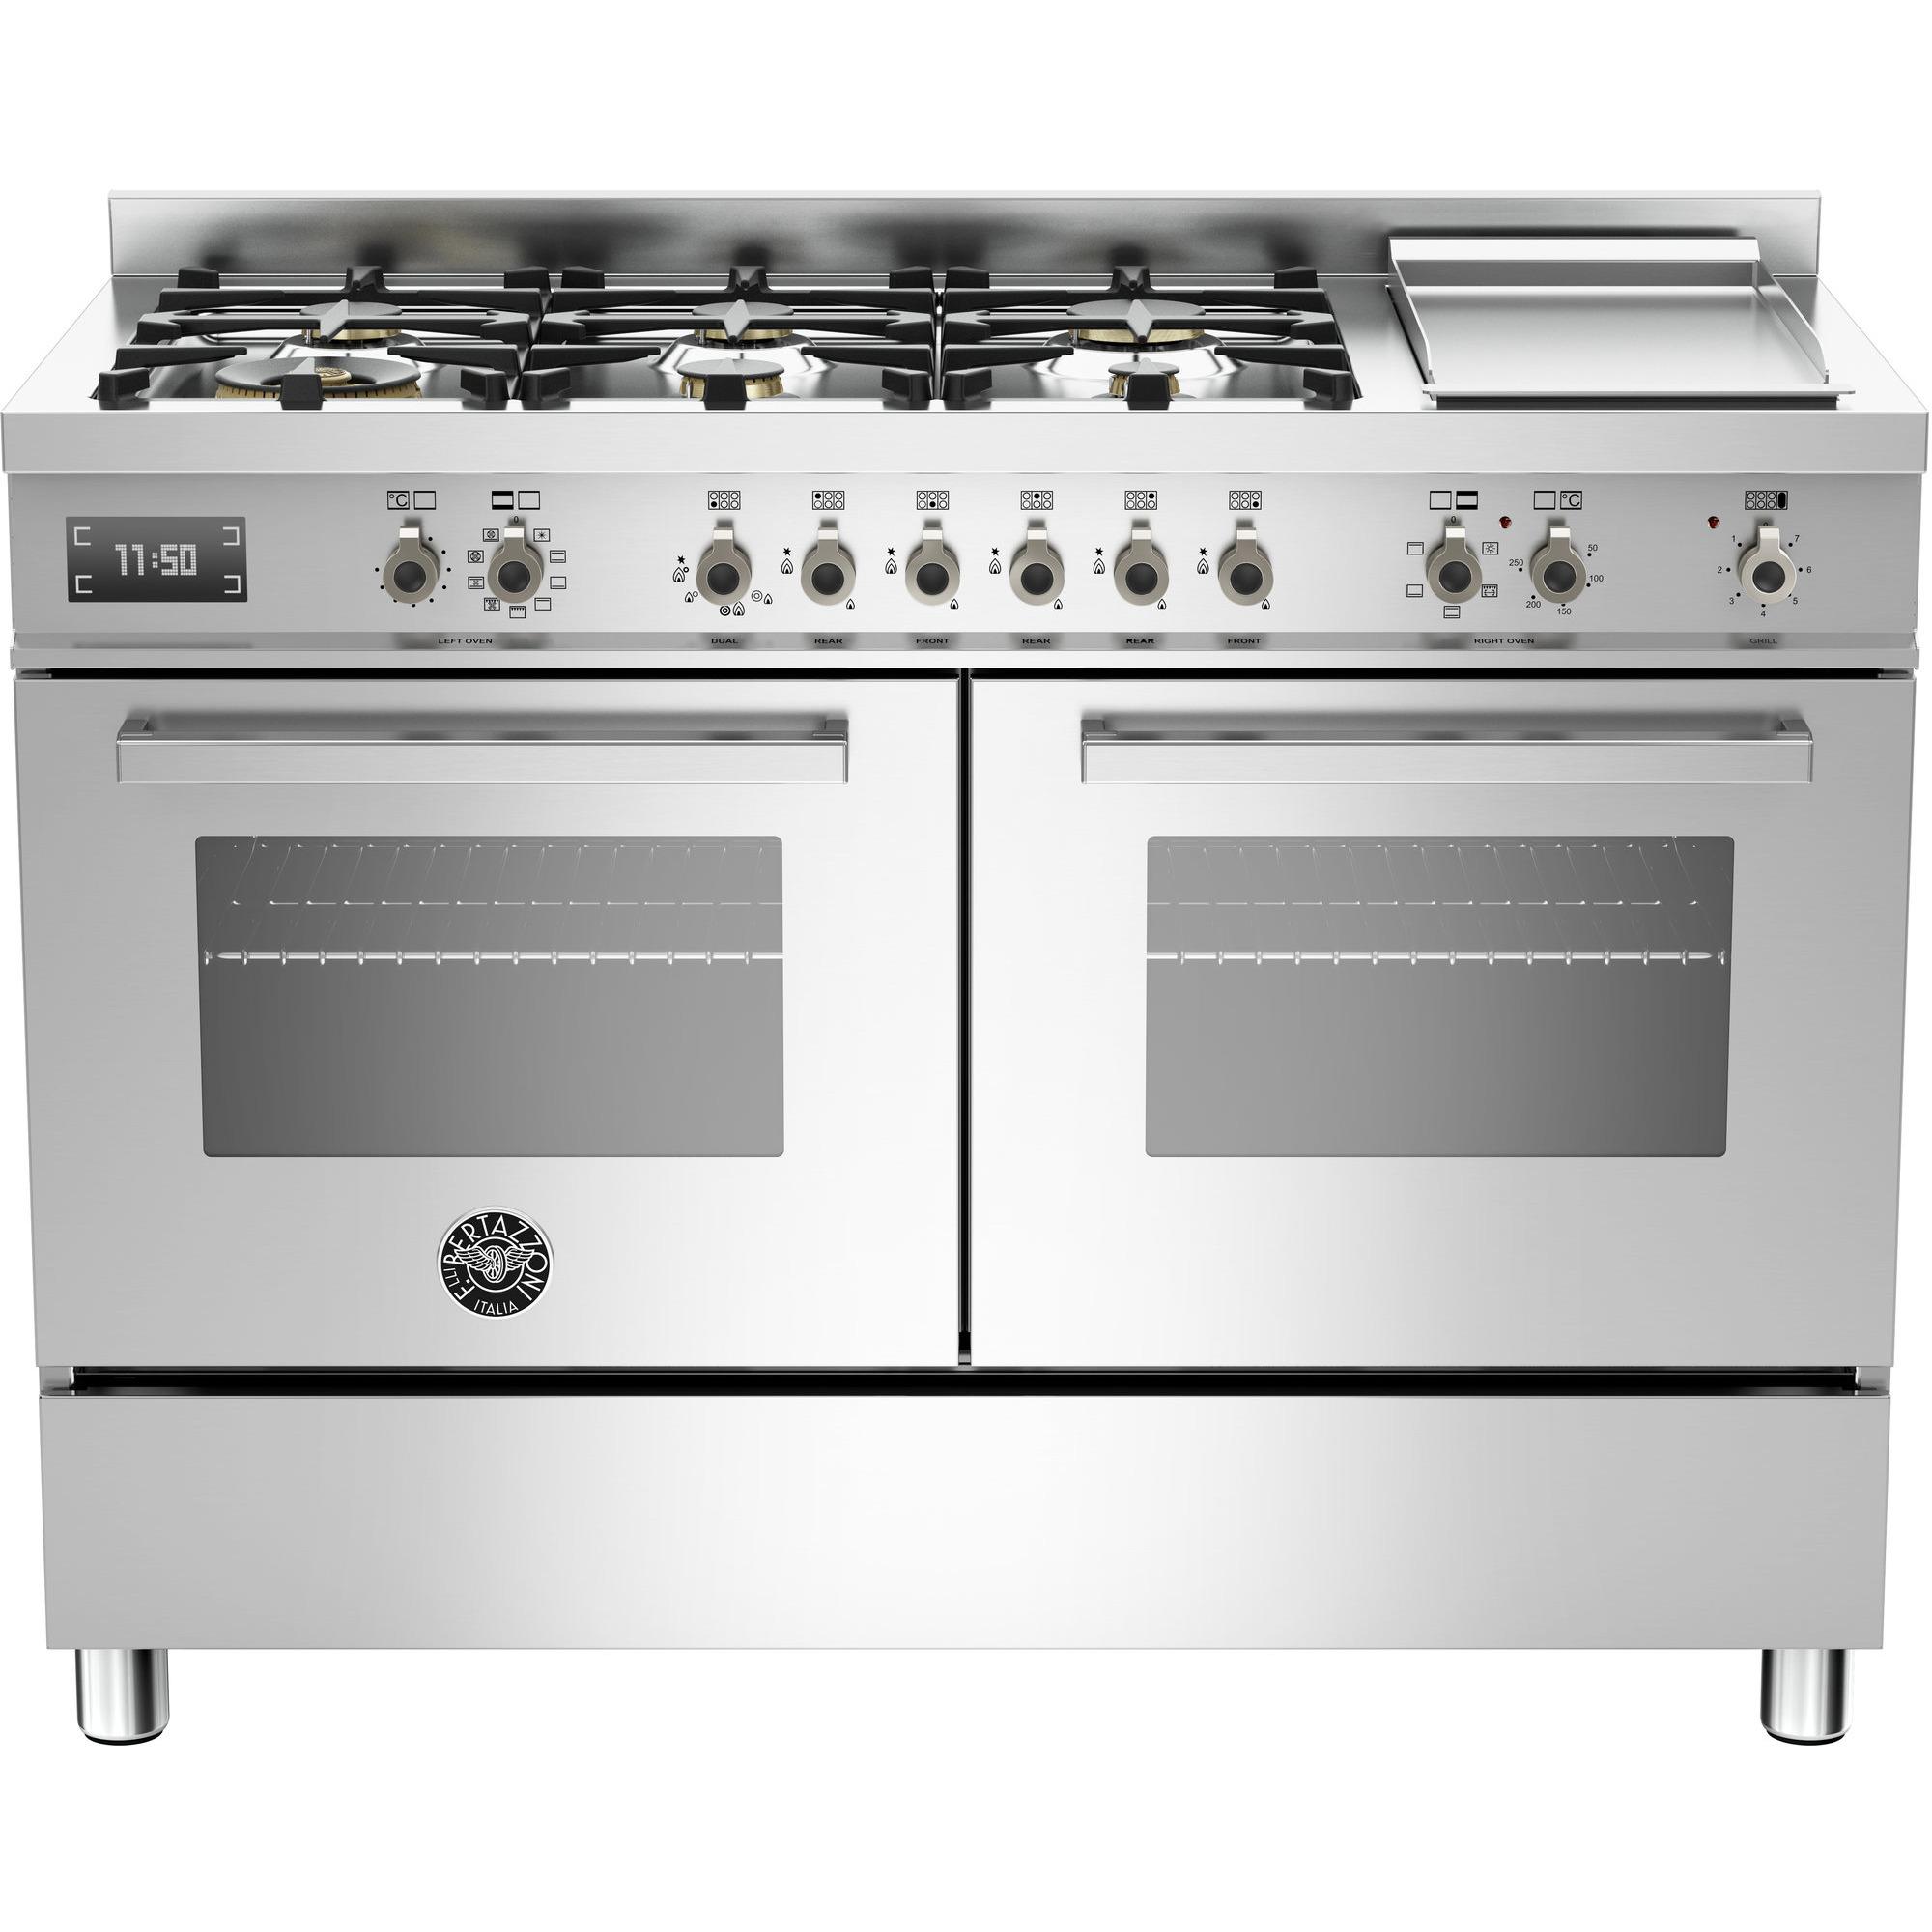 Bertazzoni PRO1206 Gasspis 120 cm 2 ugnar 6 brännare + elektrisk tepanyaki rostfri